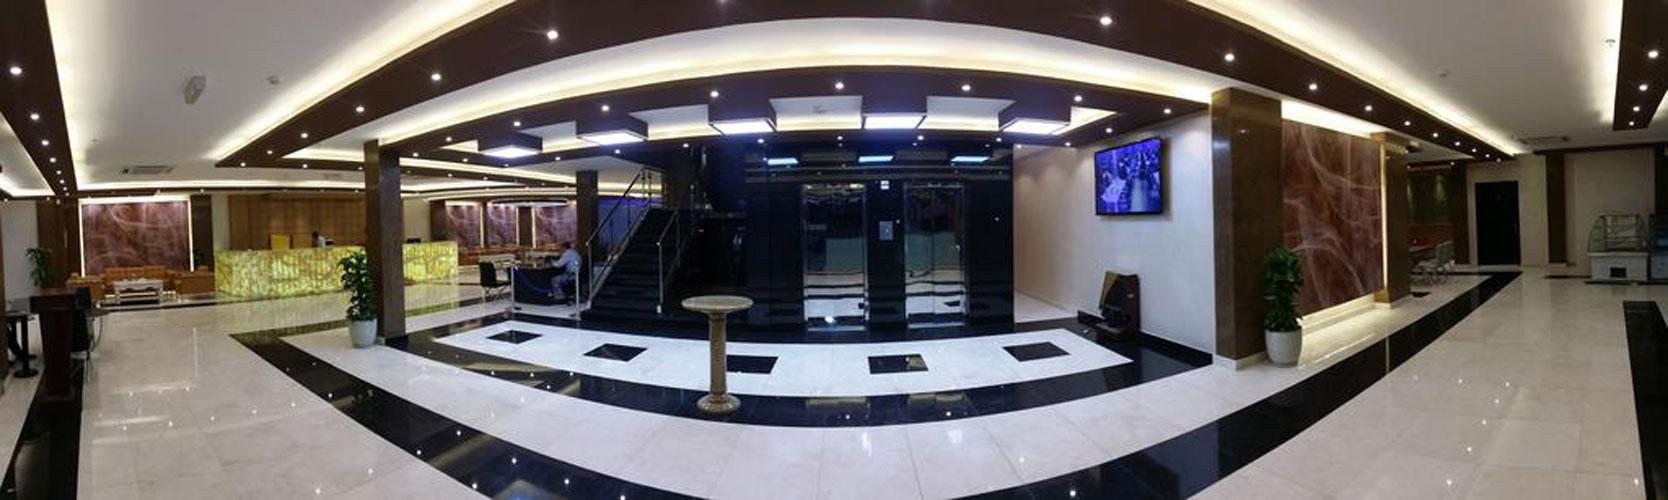 Andalus Plaza Hotel